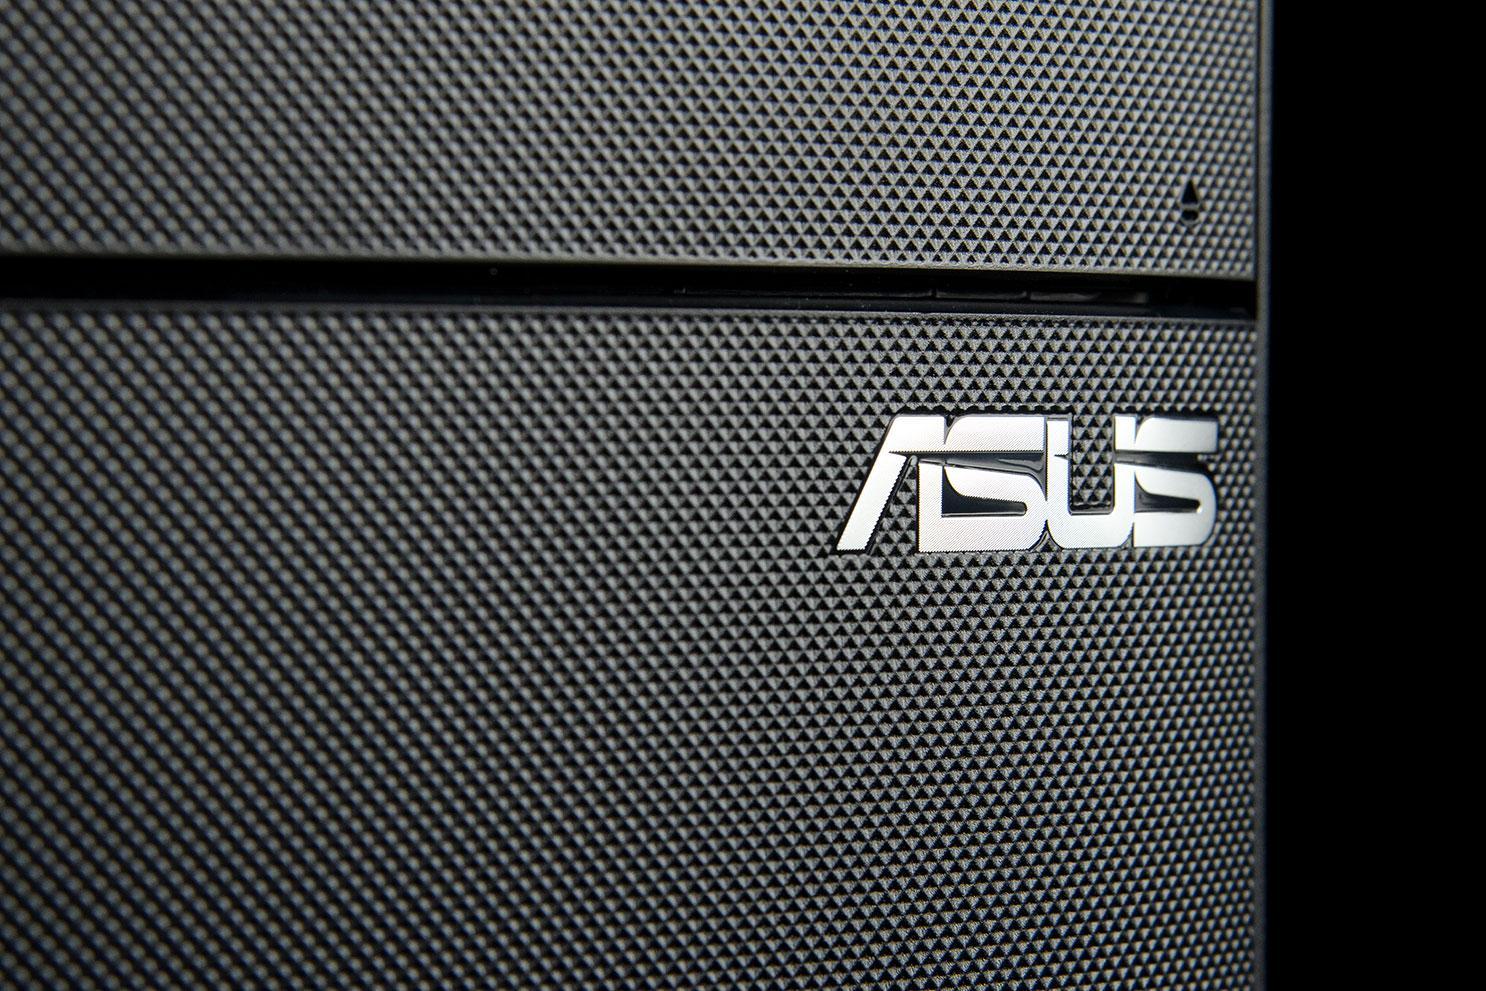 Asus-M51AC-US016S-front-asus-logo